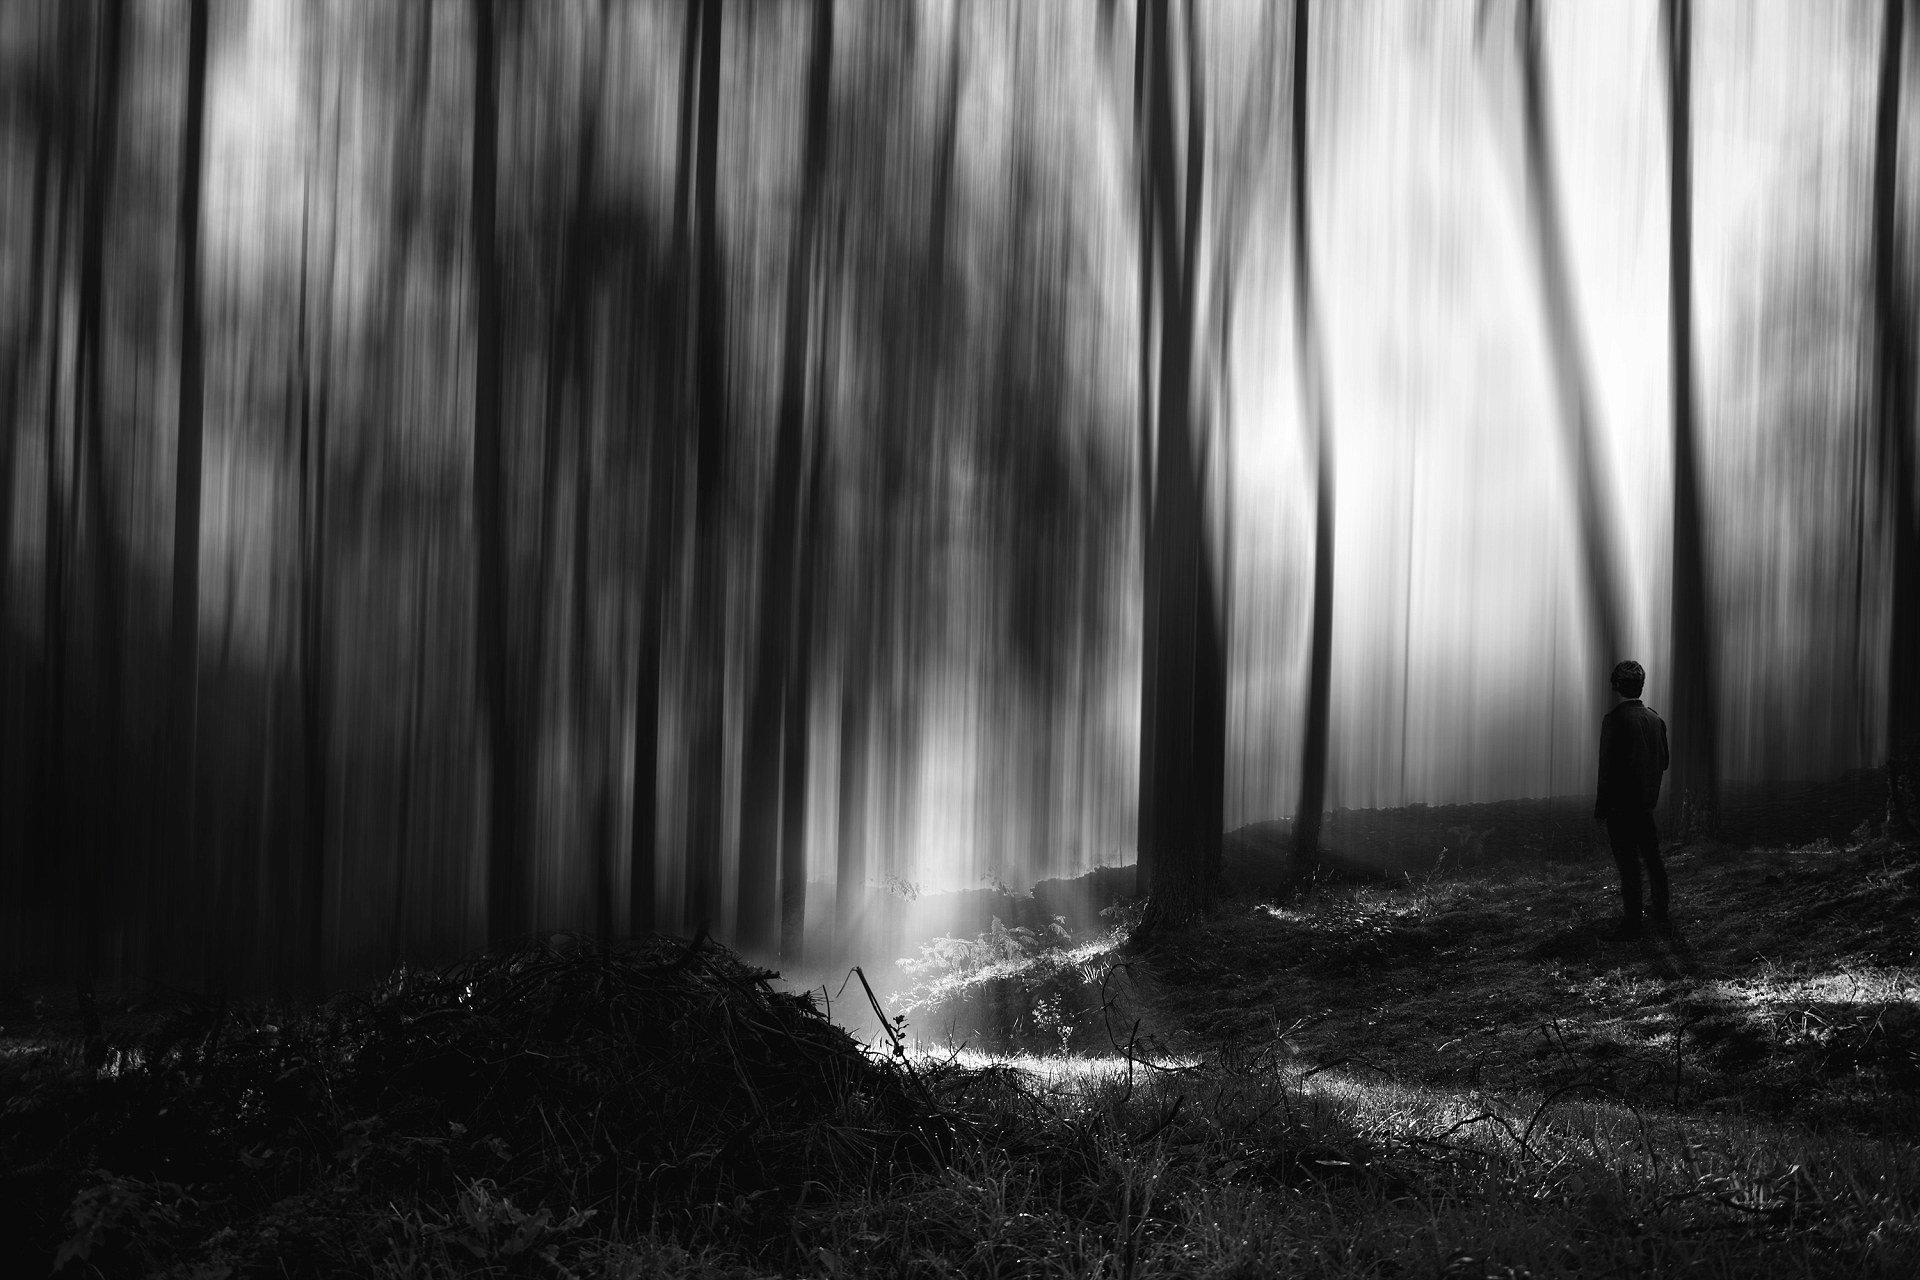 Одиночество. Фотограф - Антонио Коэльо Sony World Photography, Sony World Photography Awards 2018, лауреаты, лучшие фото, лучшие фотографии, победители, победители конкурса, фотоконкурс